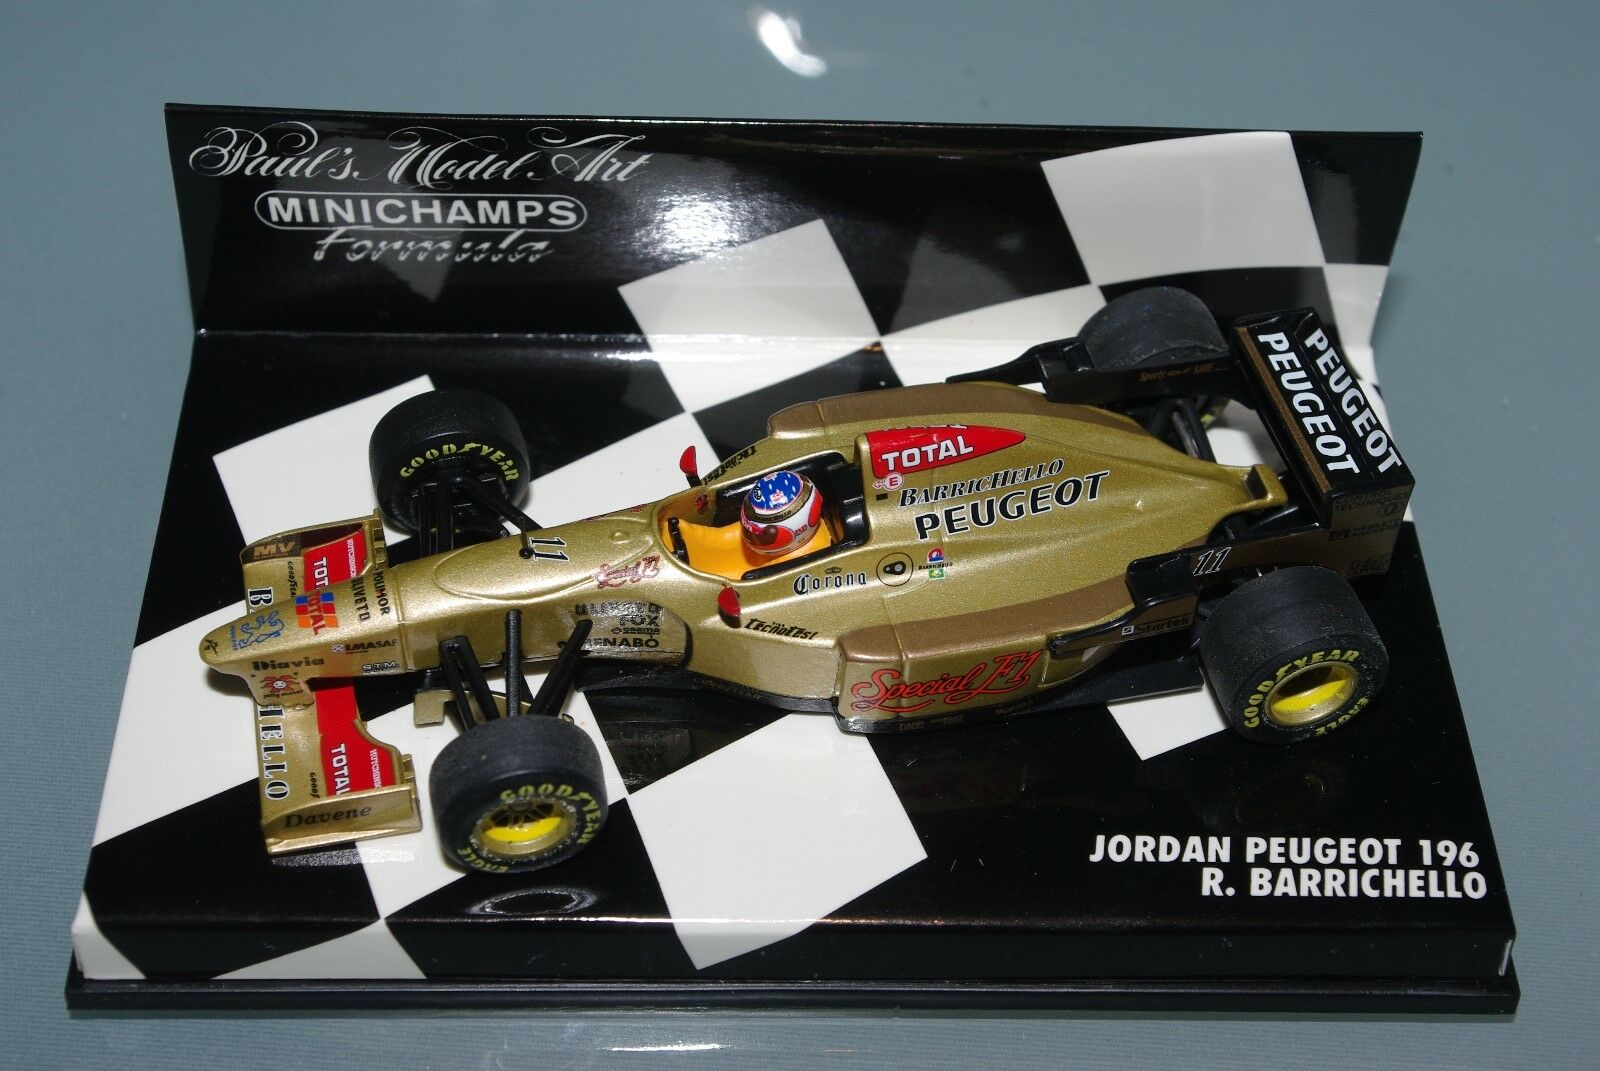 Minichamps F1 1 43 JORDAN PEUGEOT 196 Barrichello